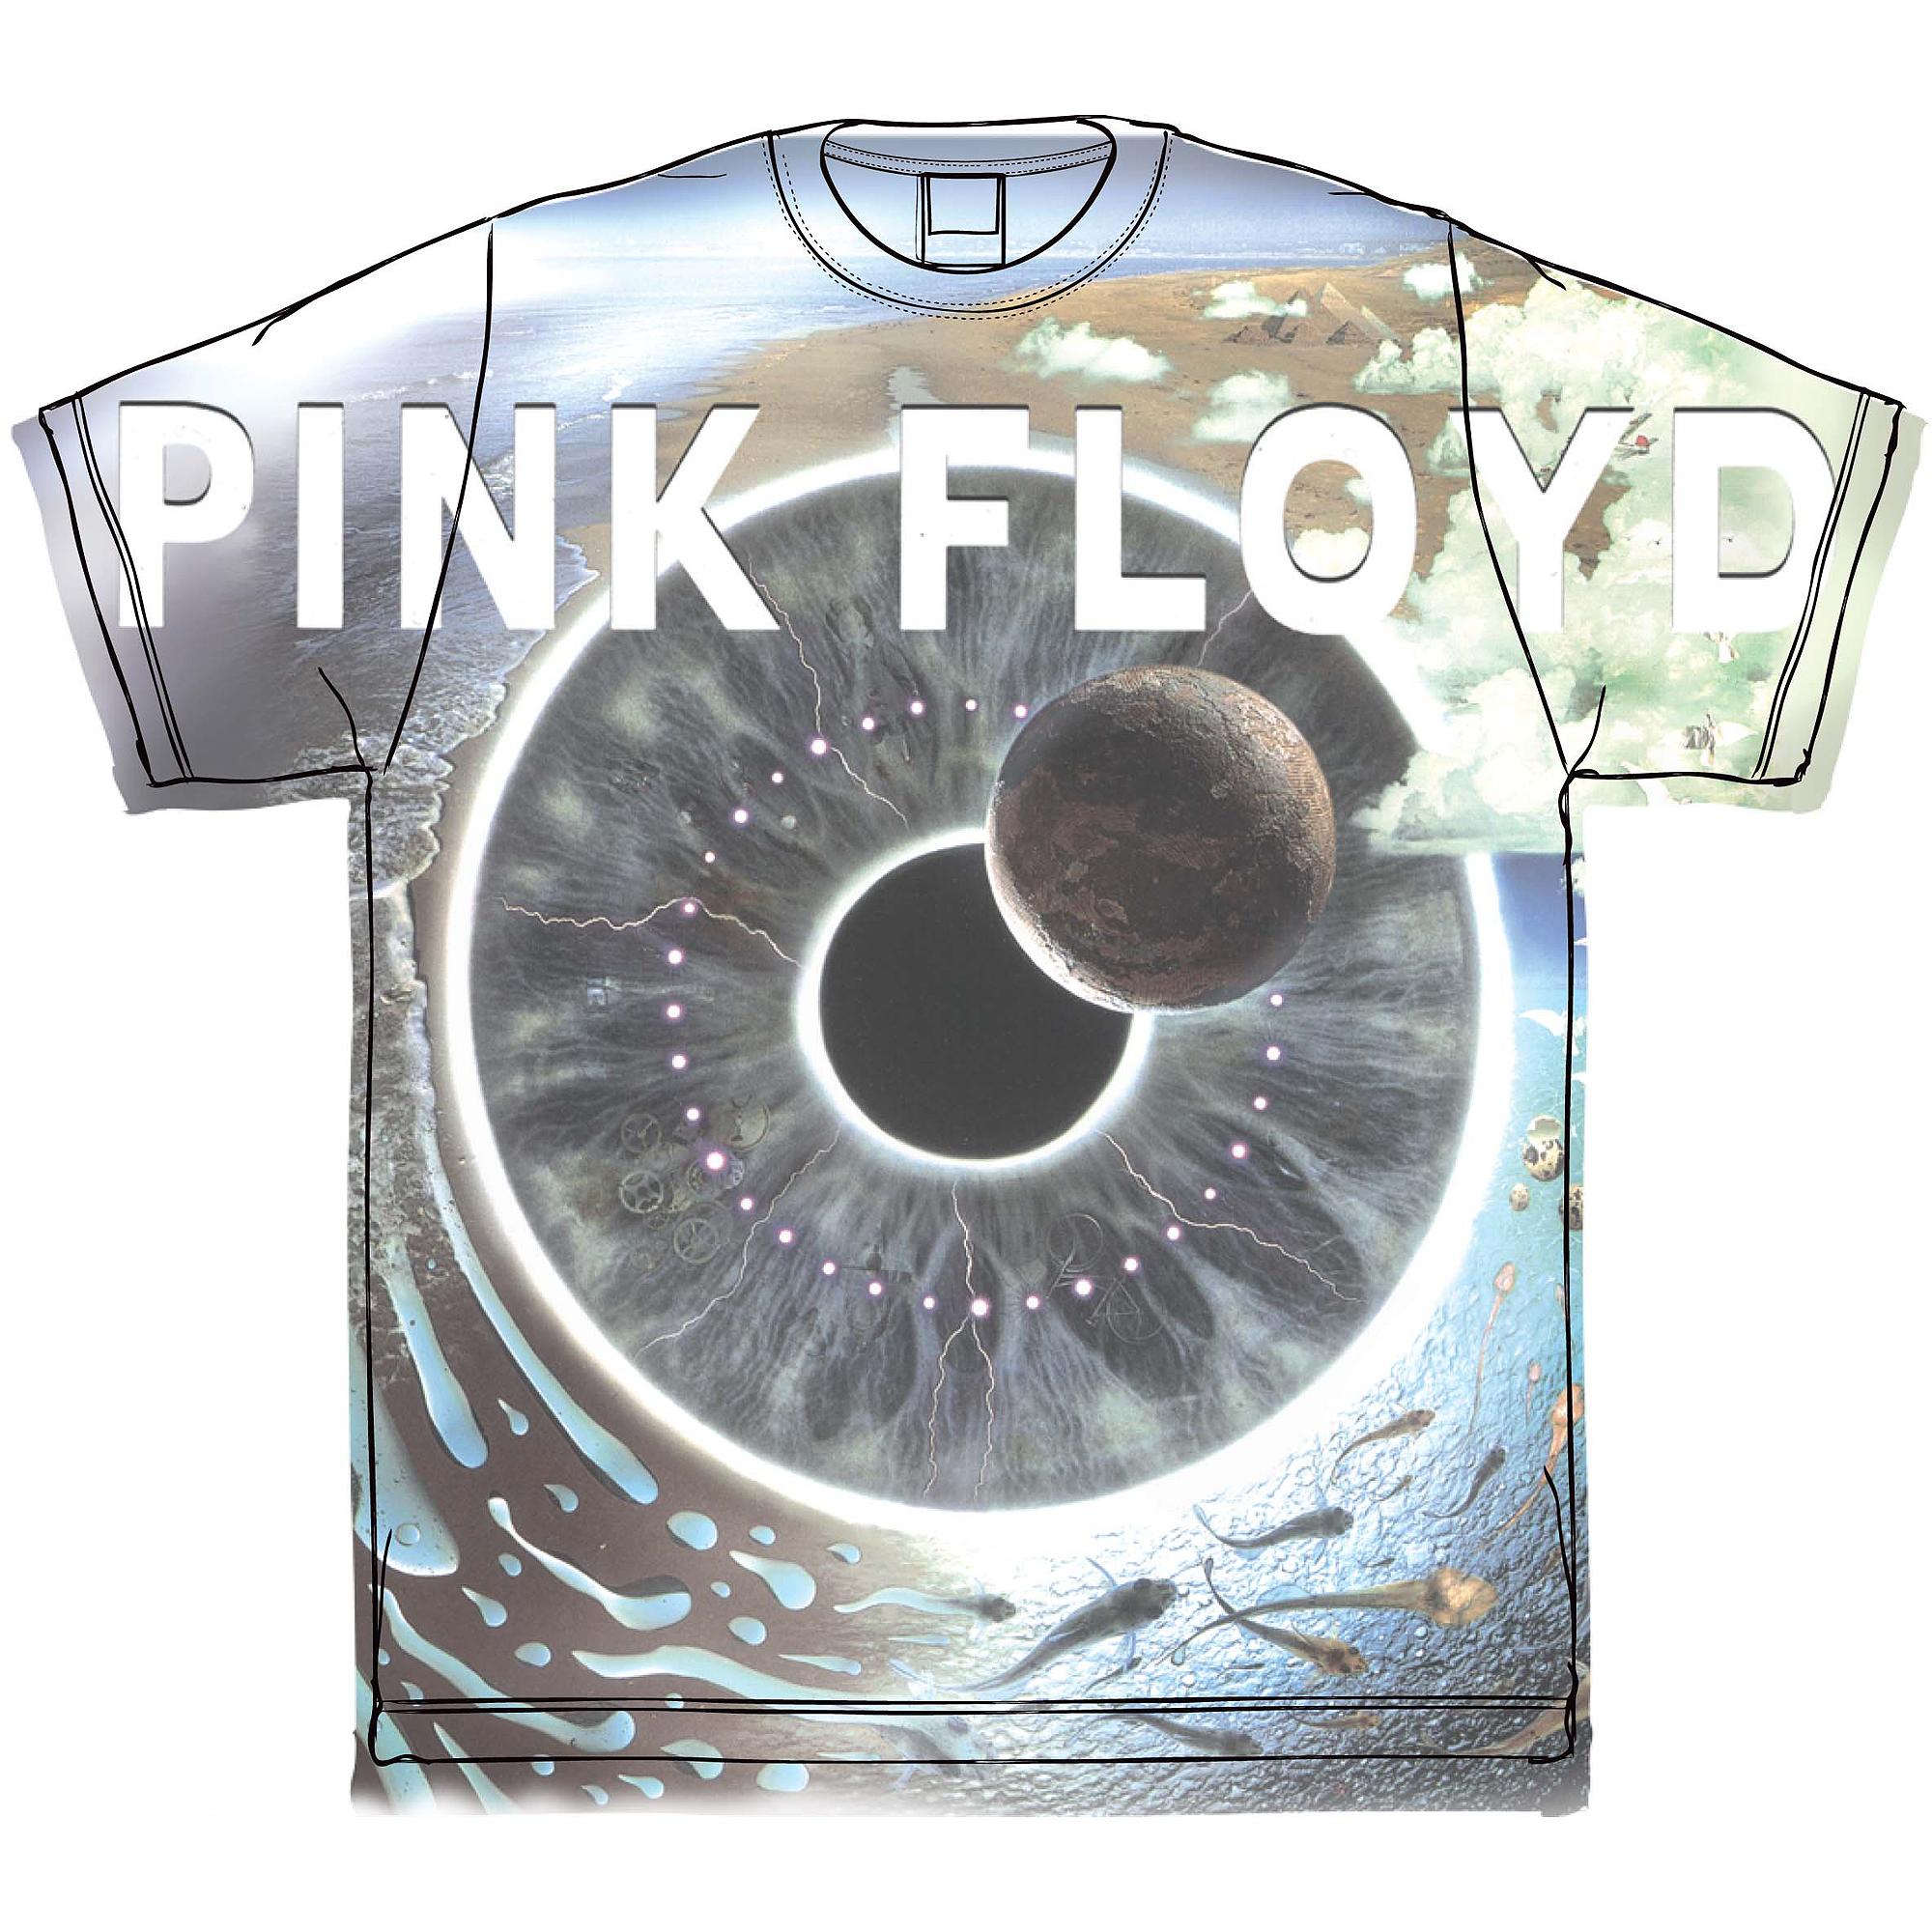 License Big Mens Pink Floyd Sub Graphic Tee